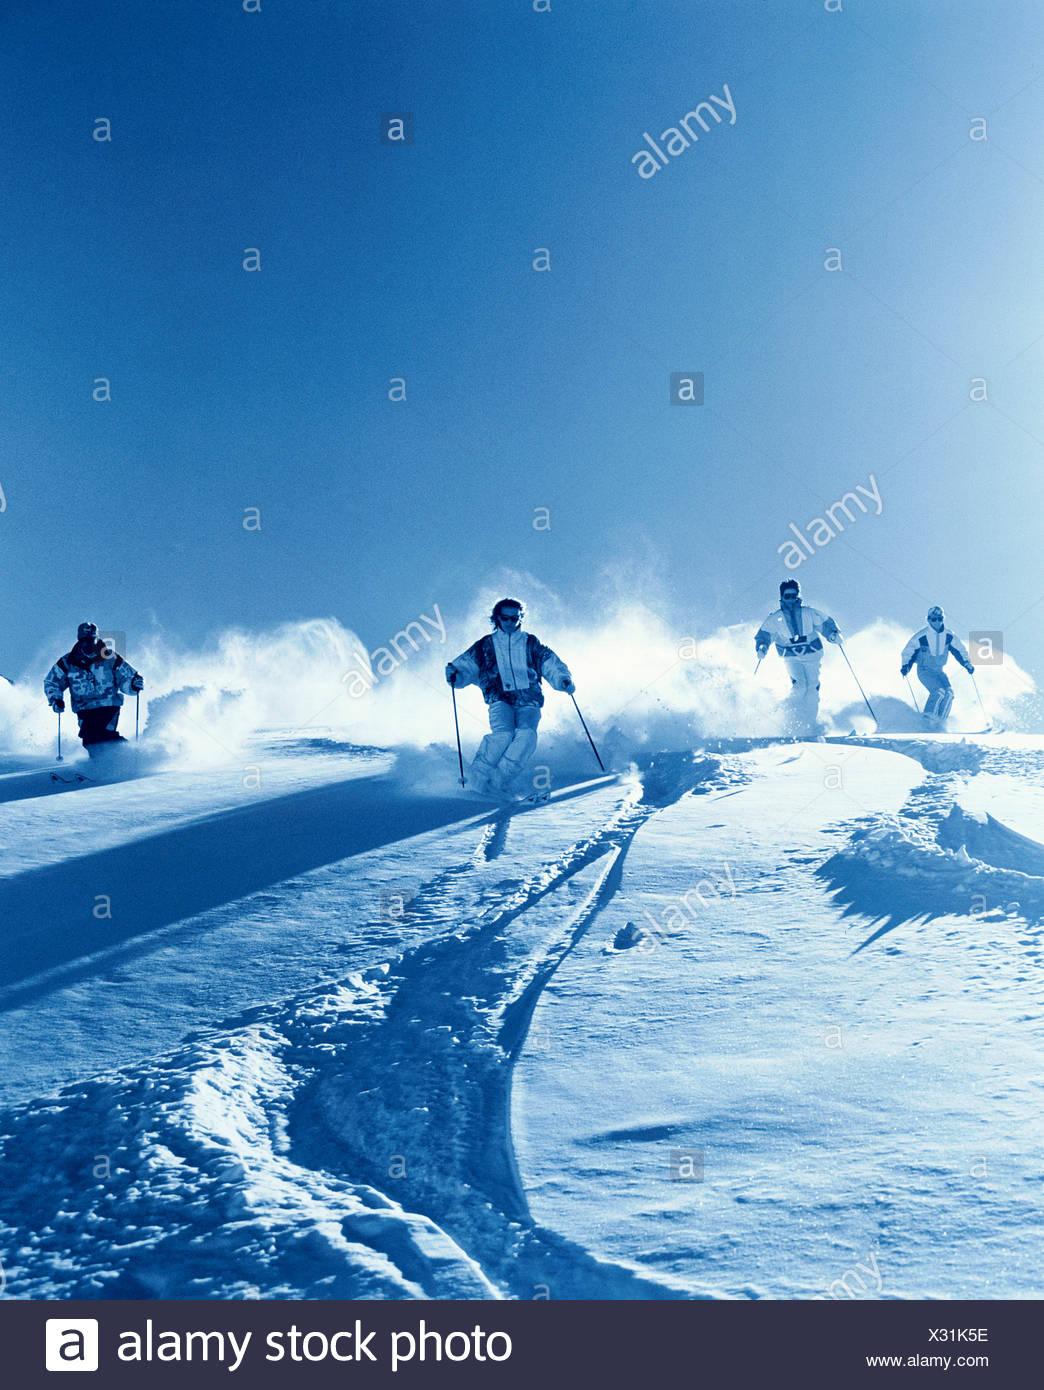 Montagnes groupe ski ski neige sport ski monochromes de la neige profonde neige hiver hiver conduite s Photo Stock